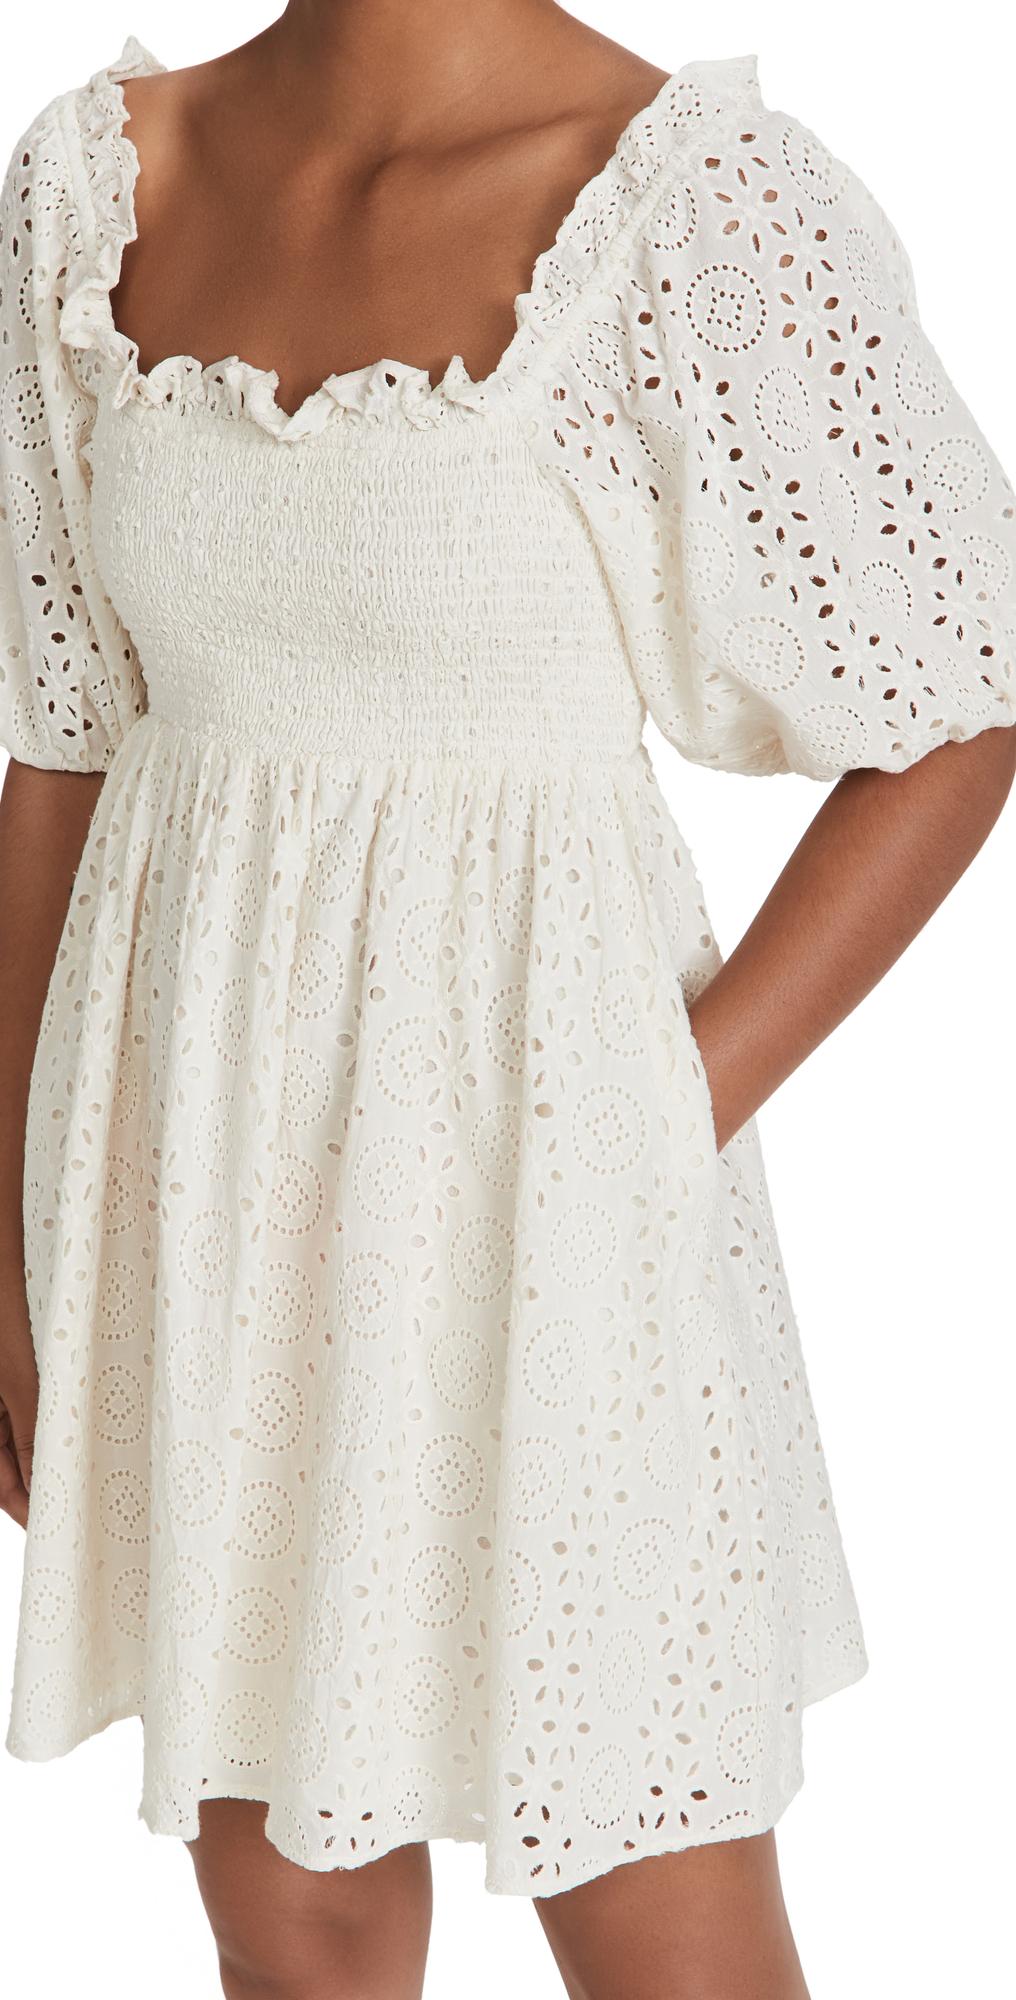 Lucca Mini Dress